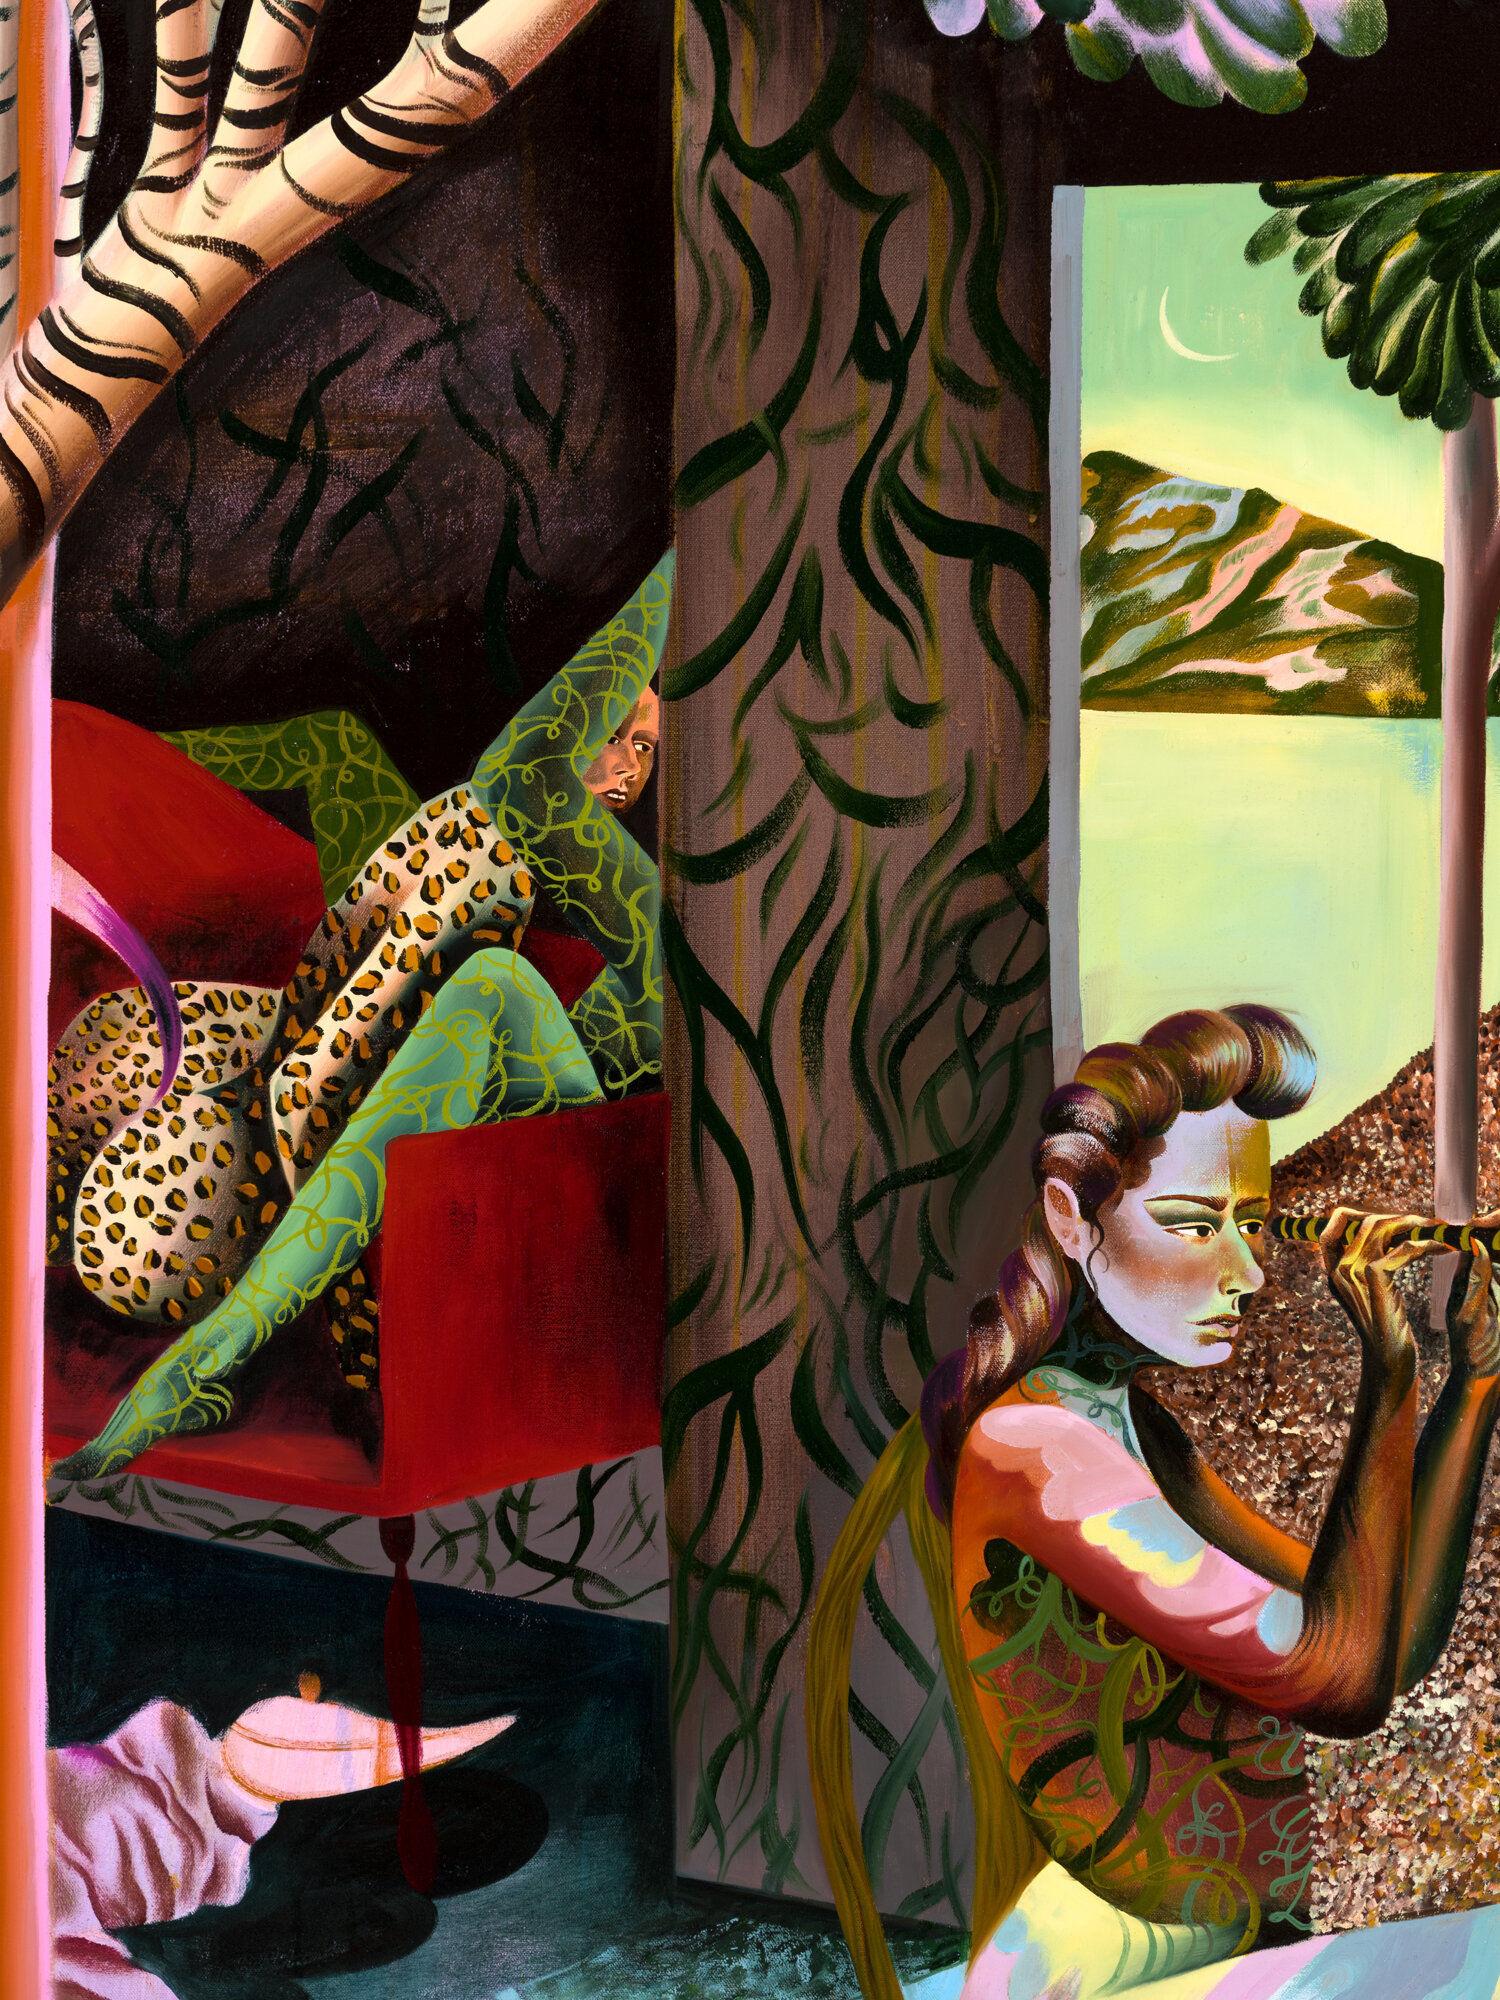 Lyles & King presents JESSIE MAKINSON 'Dangerous Pleasing' March 27 - May 10, 2020